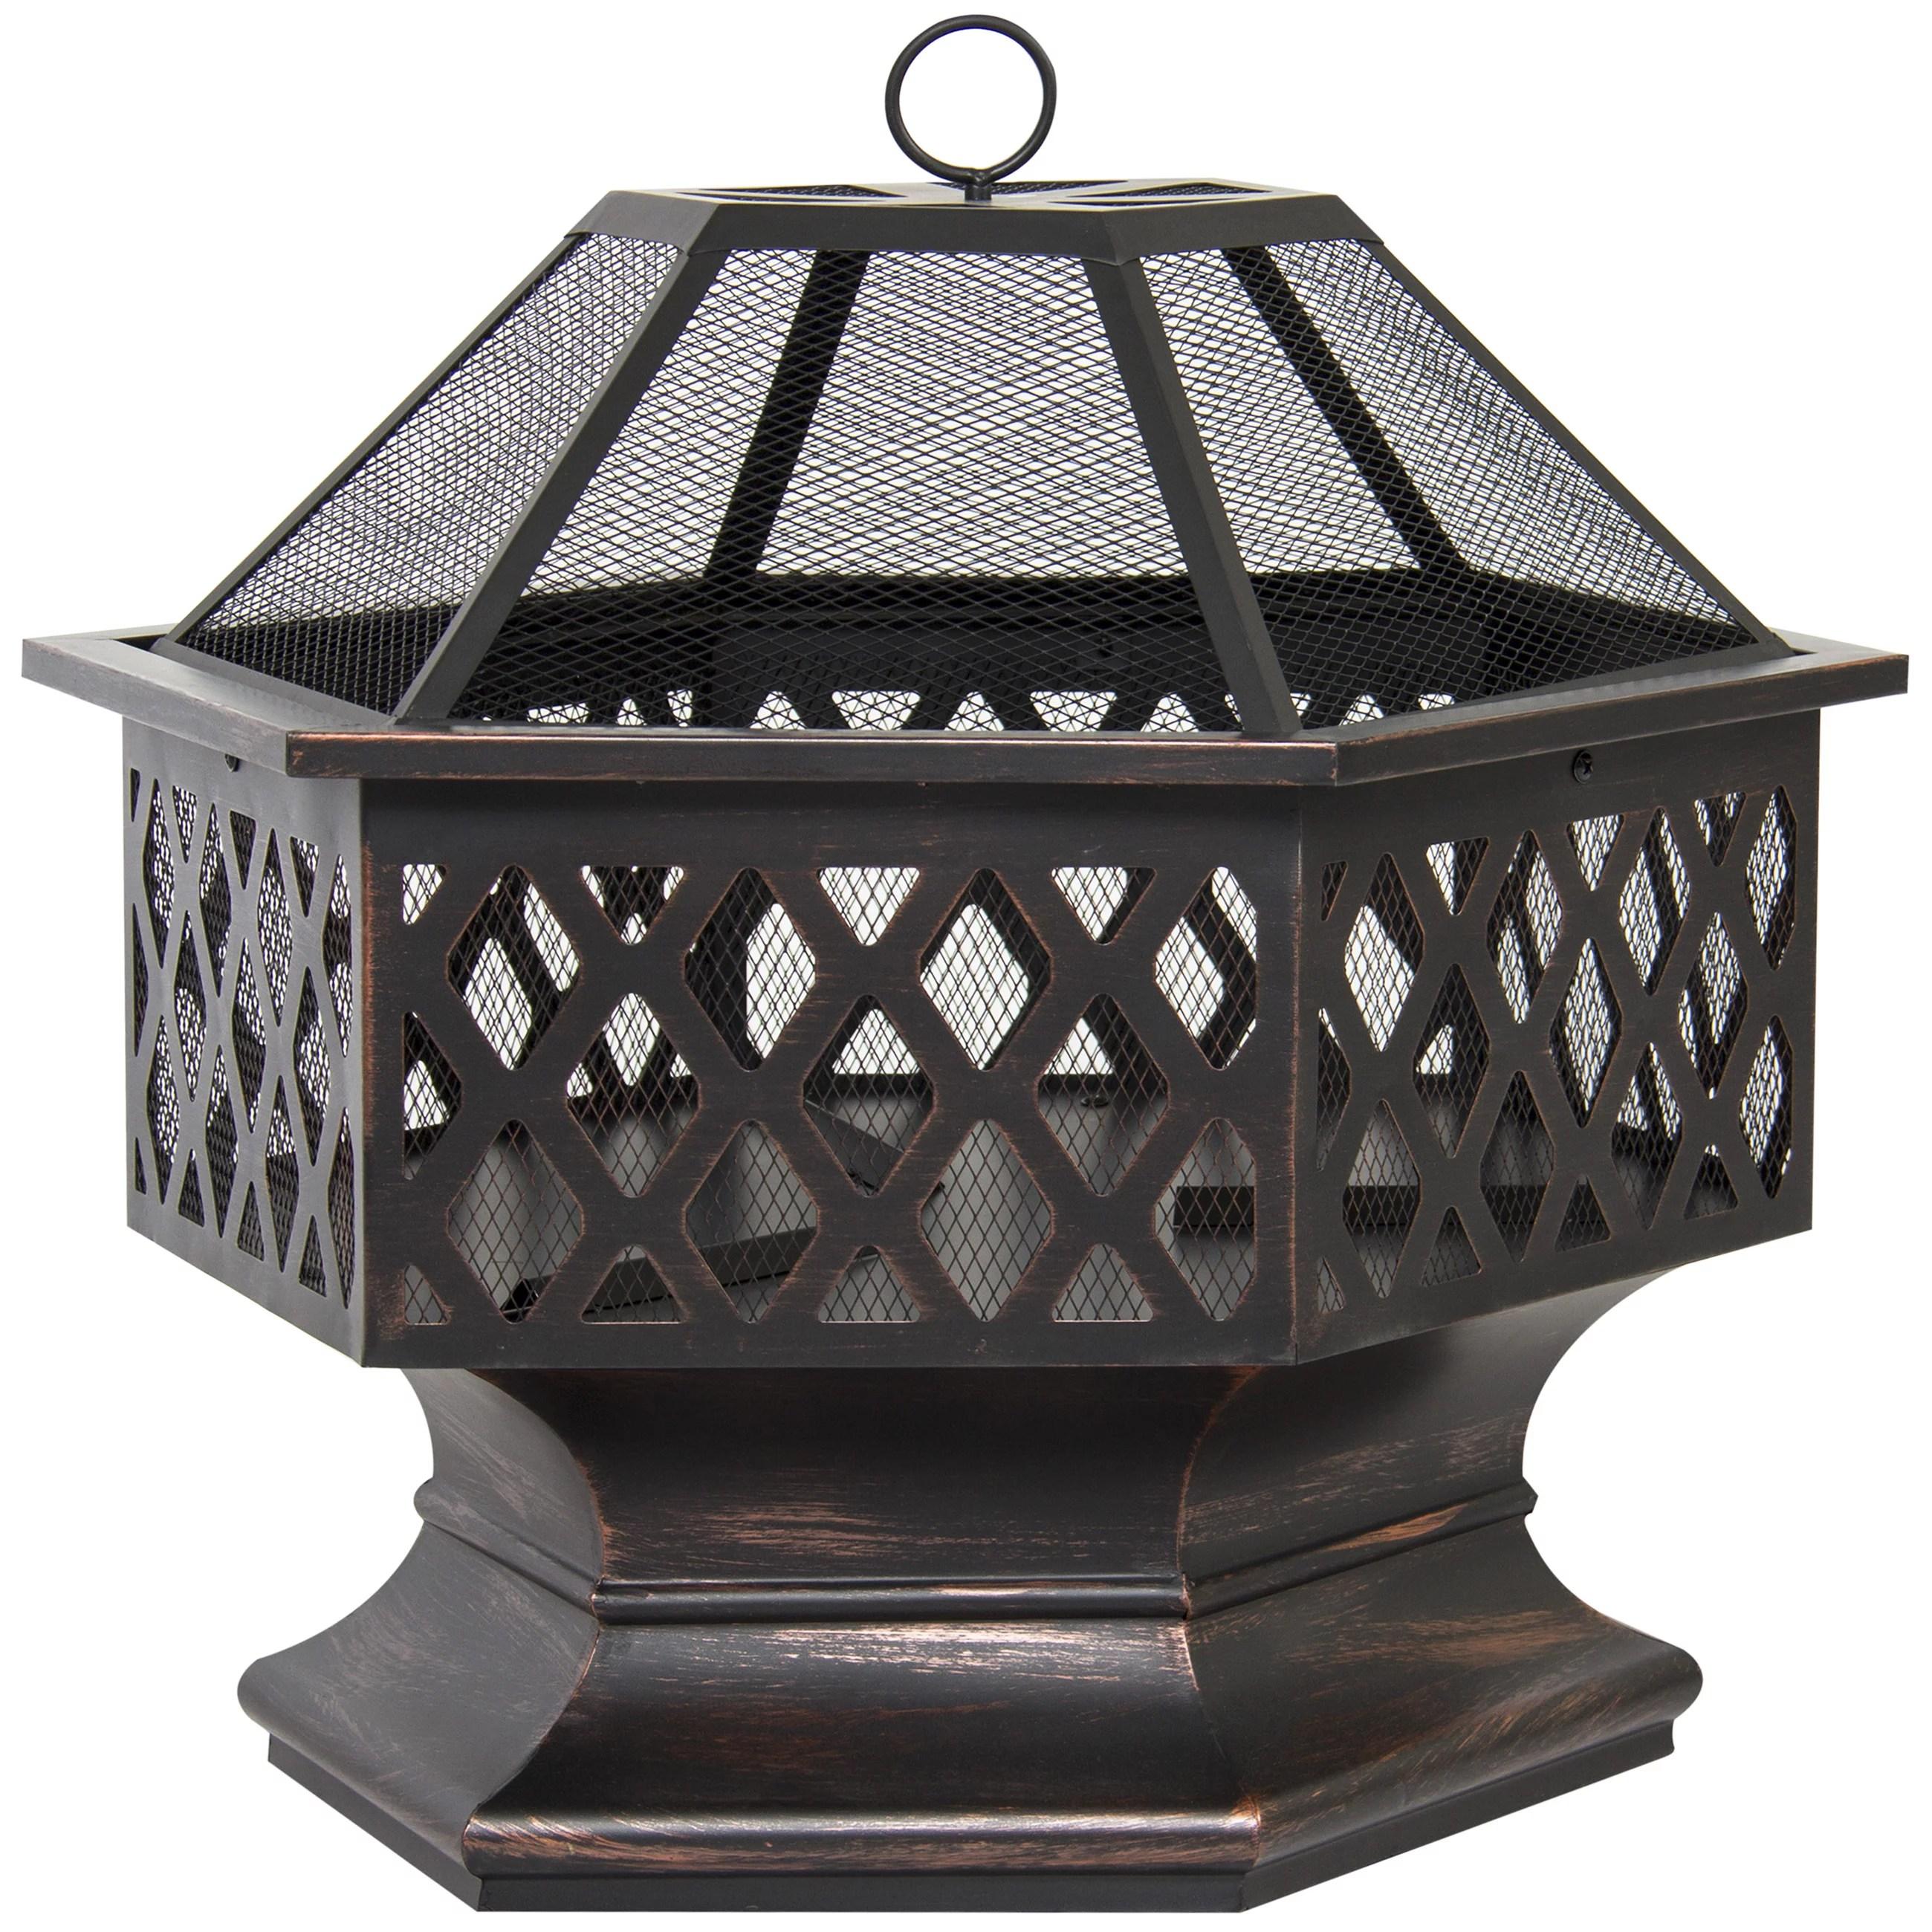 zeny 24 outdoor hex shaped patio fire pit home garden backyard firepit bowl fireplace